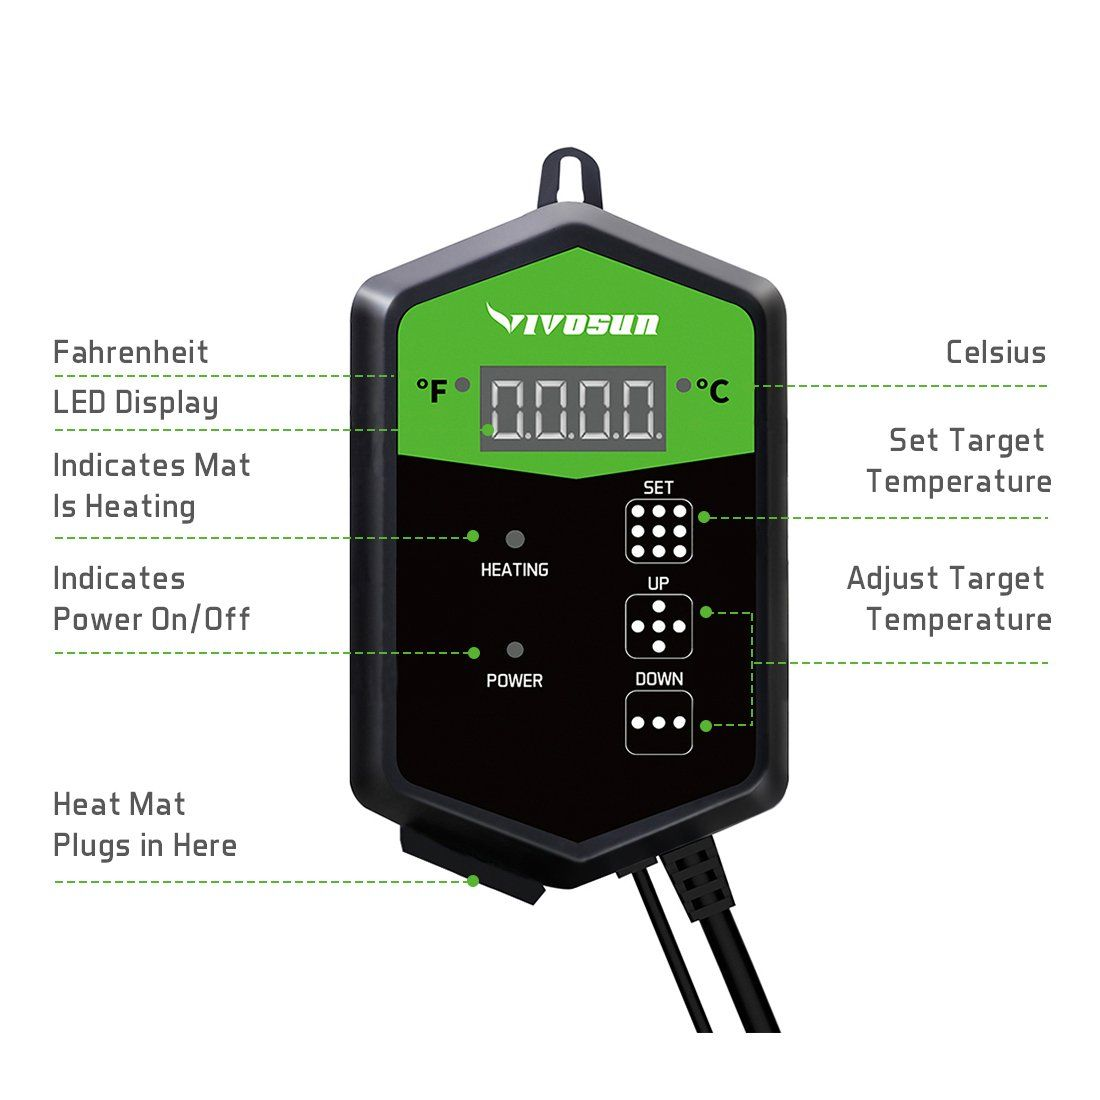 Vivosun 10x20 75 Seedling Heat Mat And Digital Thermostat Combo Set Met Standard You Can Obtain Additional Hydroponic Gardening Heat Mat Digital Thermostat